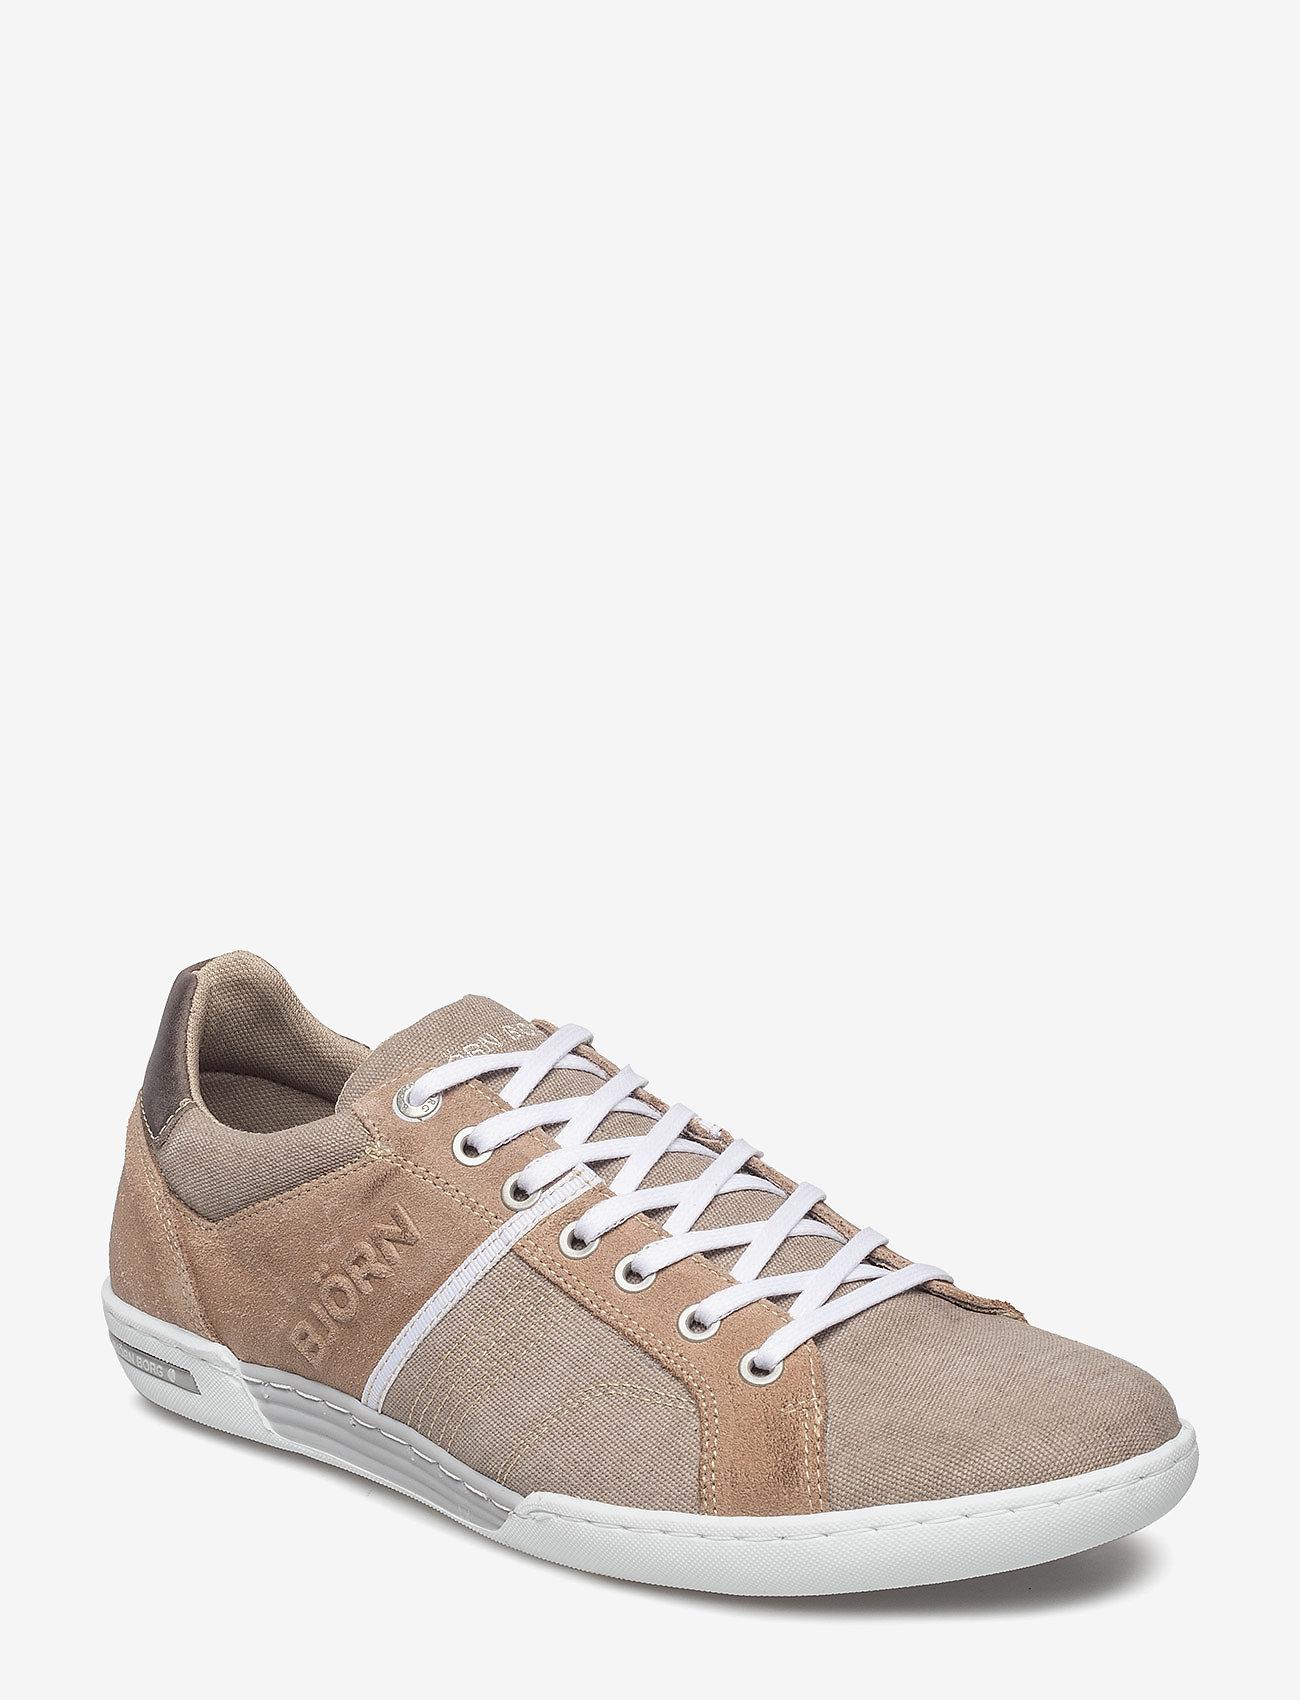 Björn Borg - Coltrane Cvs - laag sneakers - sand-dk grey - 0